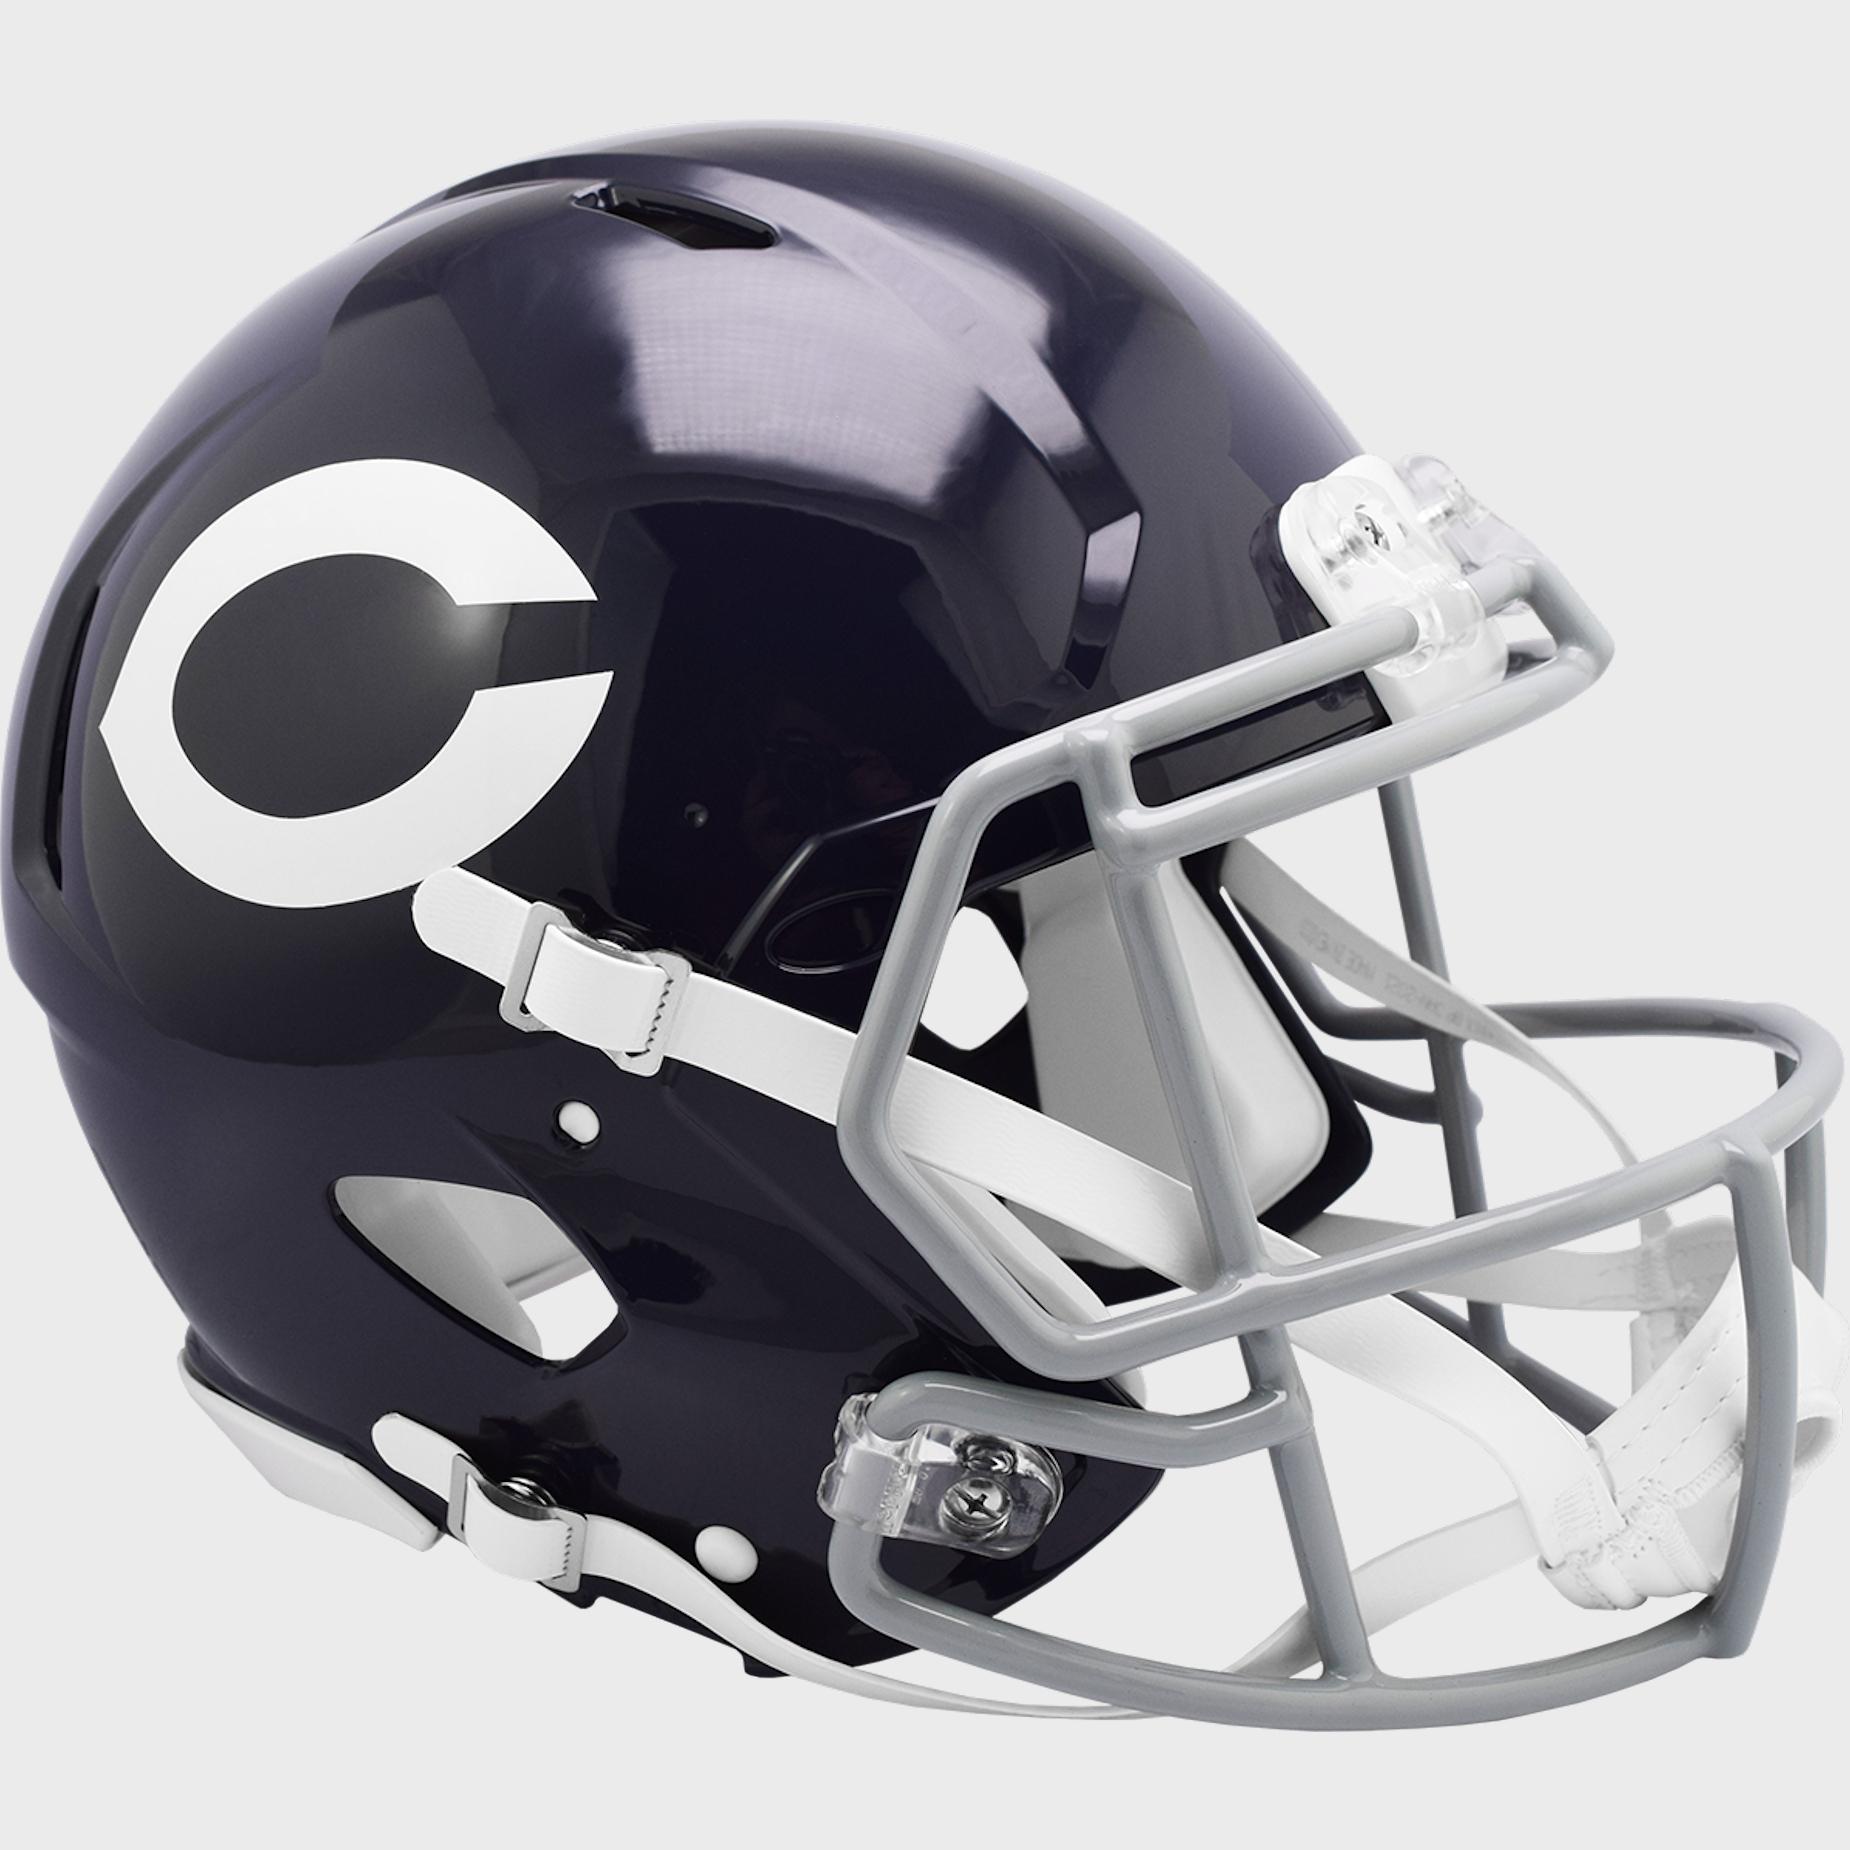 Chicago Bears 1962 to 1973 Speed Throwback Football Helmet